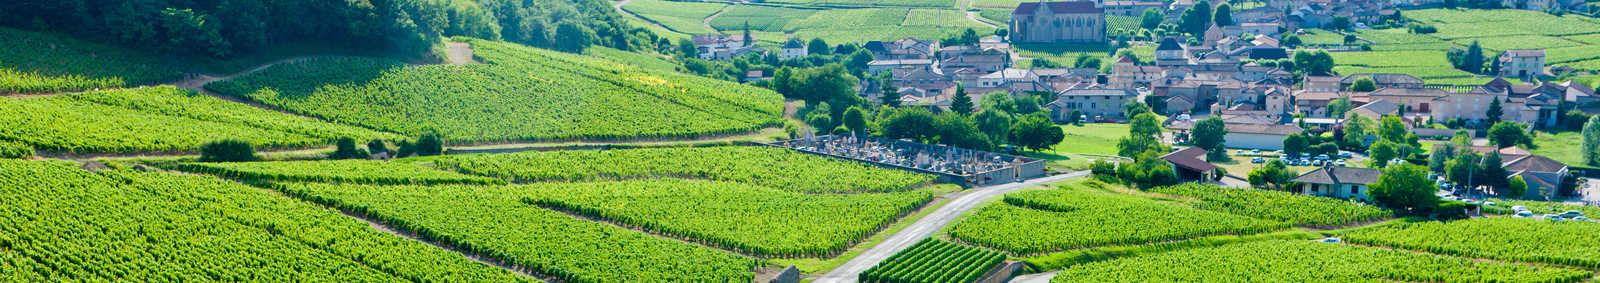 Vineyards in Burgundy, France